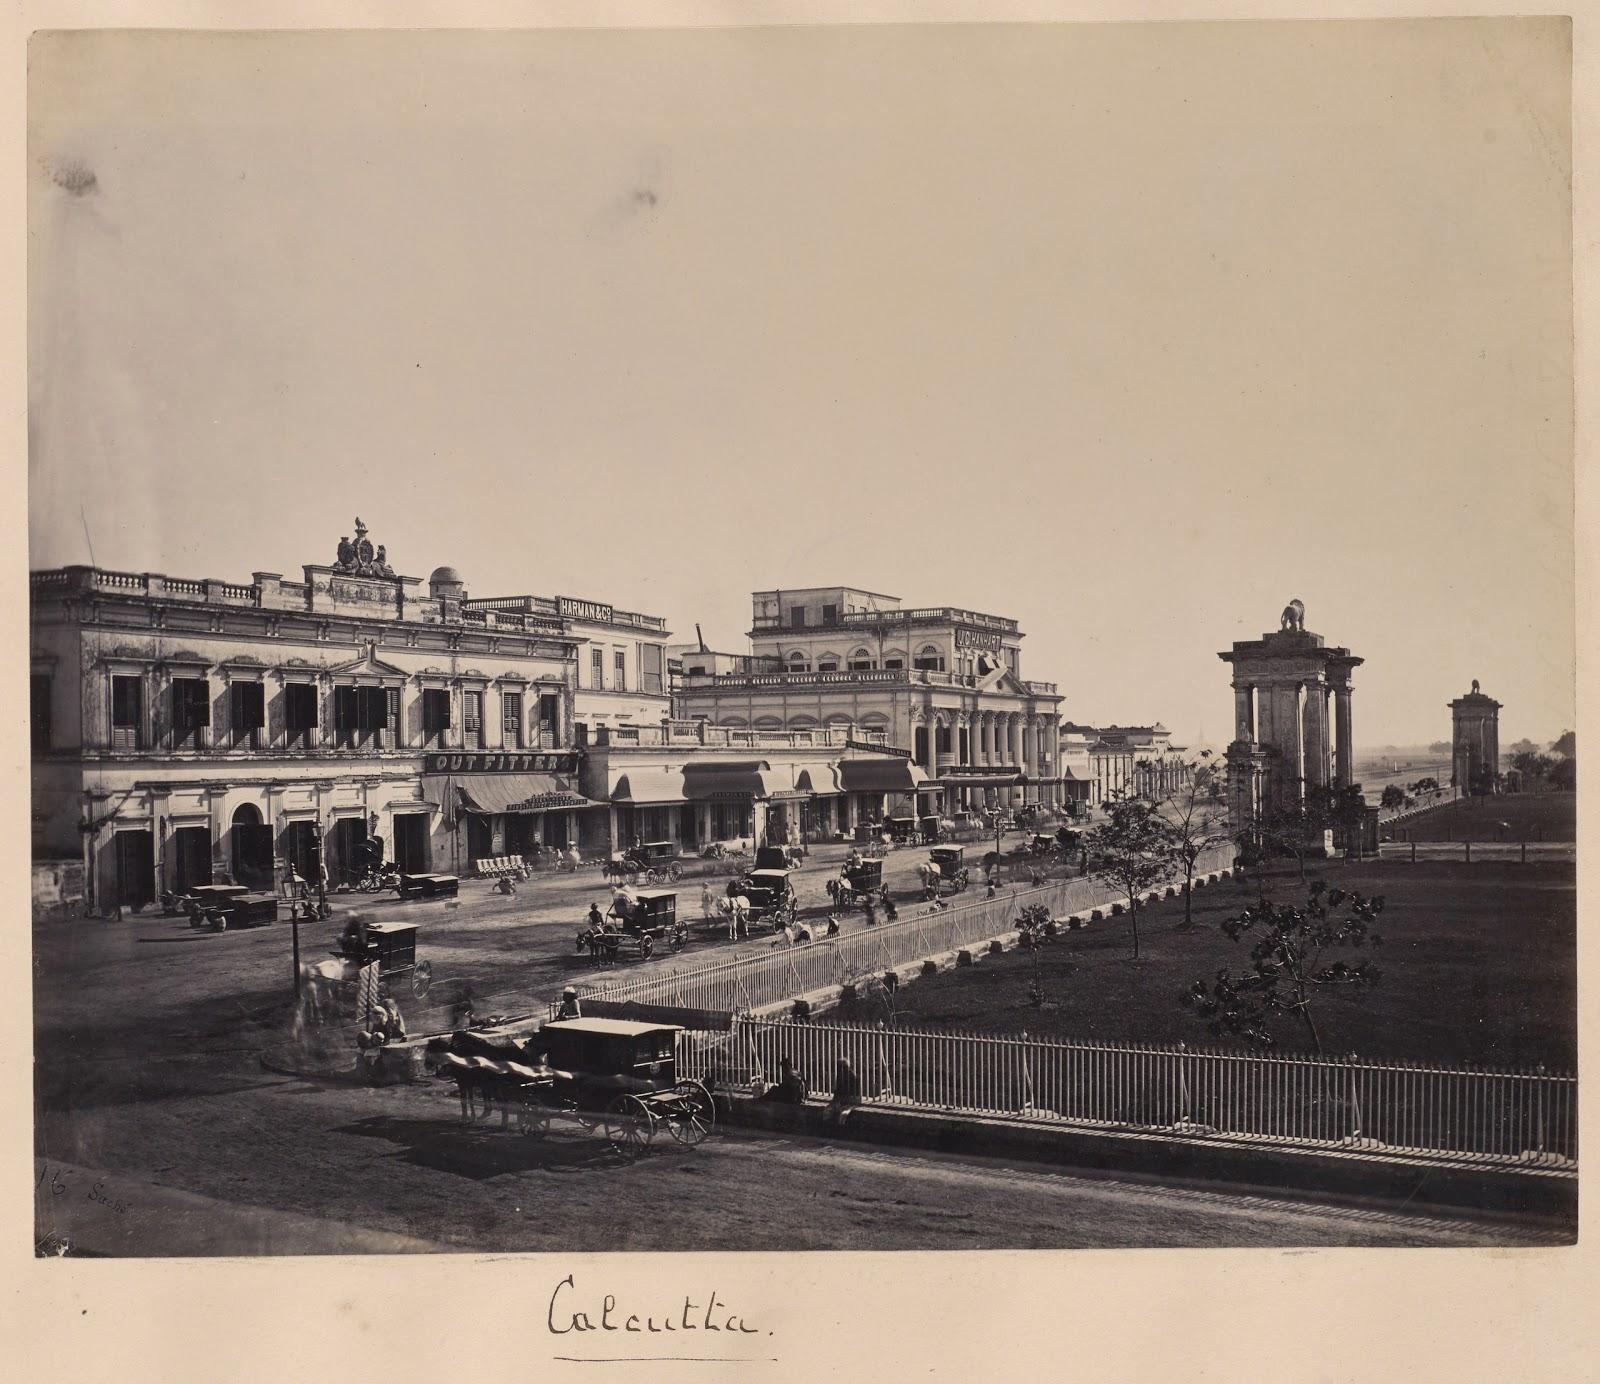 Calcutta (Kolkata) Buildings and Street Scene - C1881